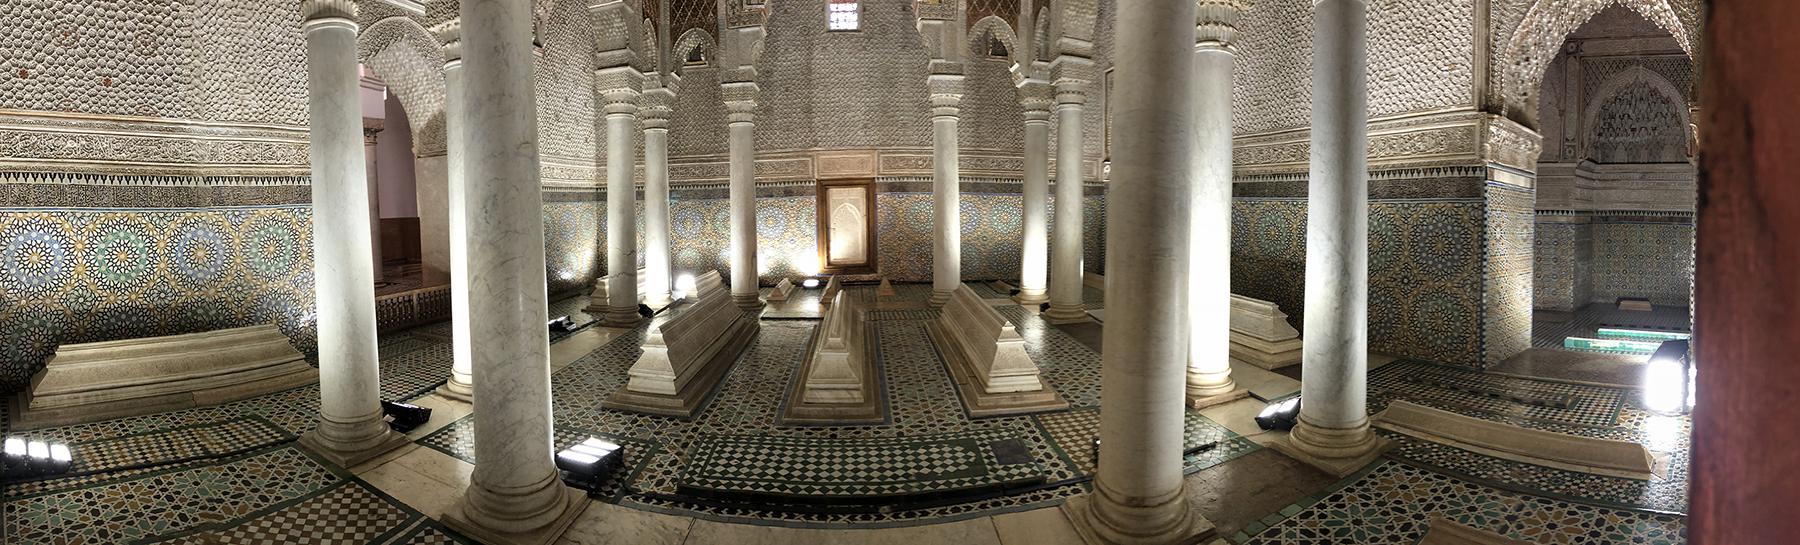 Marrakech_palais_IMG_0178